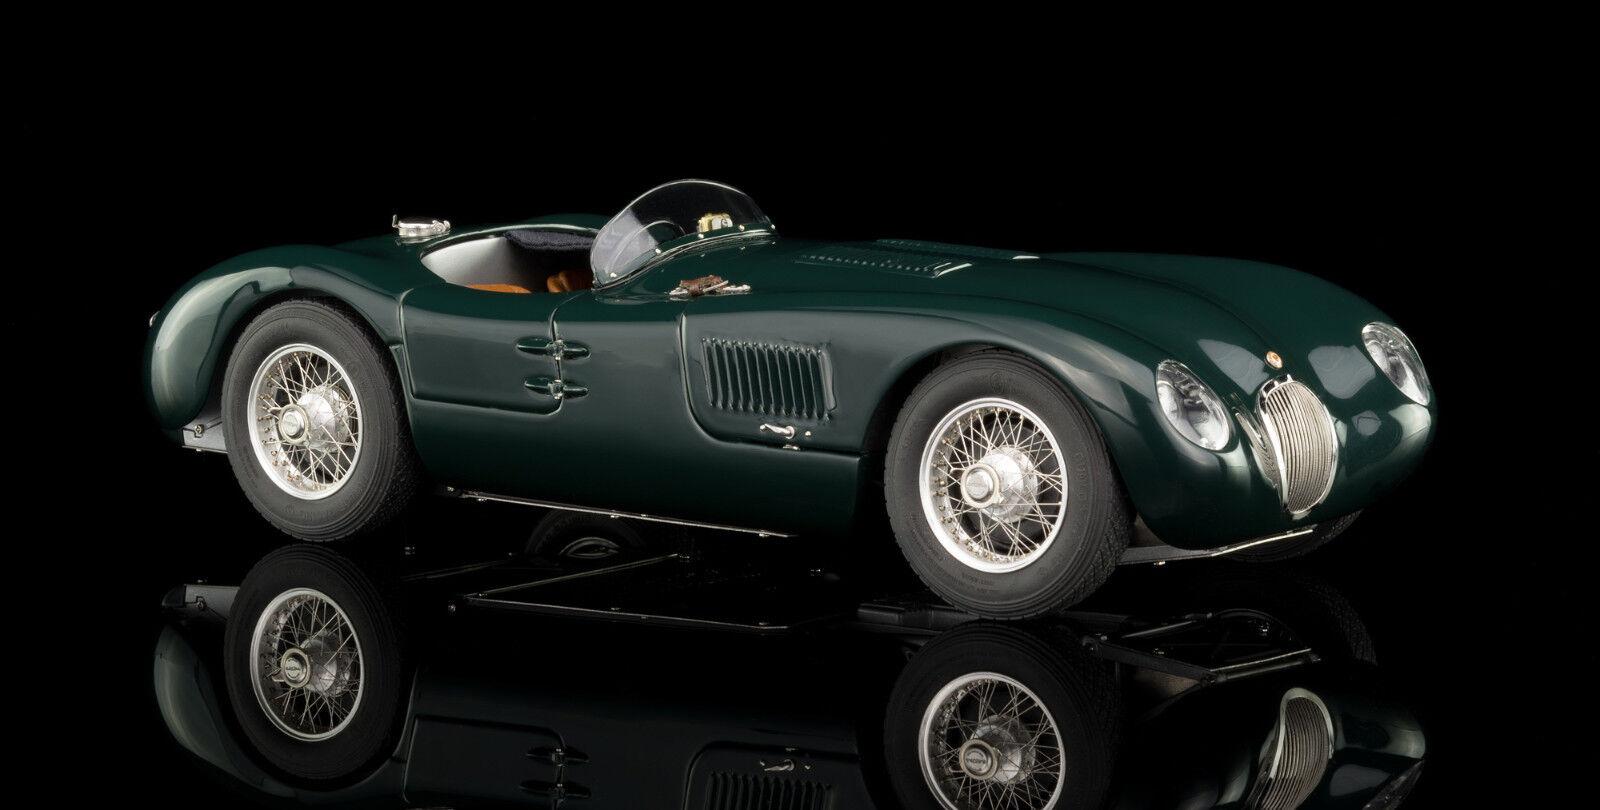 Jaguar C-Type British Racing vert vert vert 1952 CMC m-191 neu&ovp cdbfa7